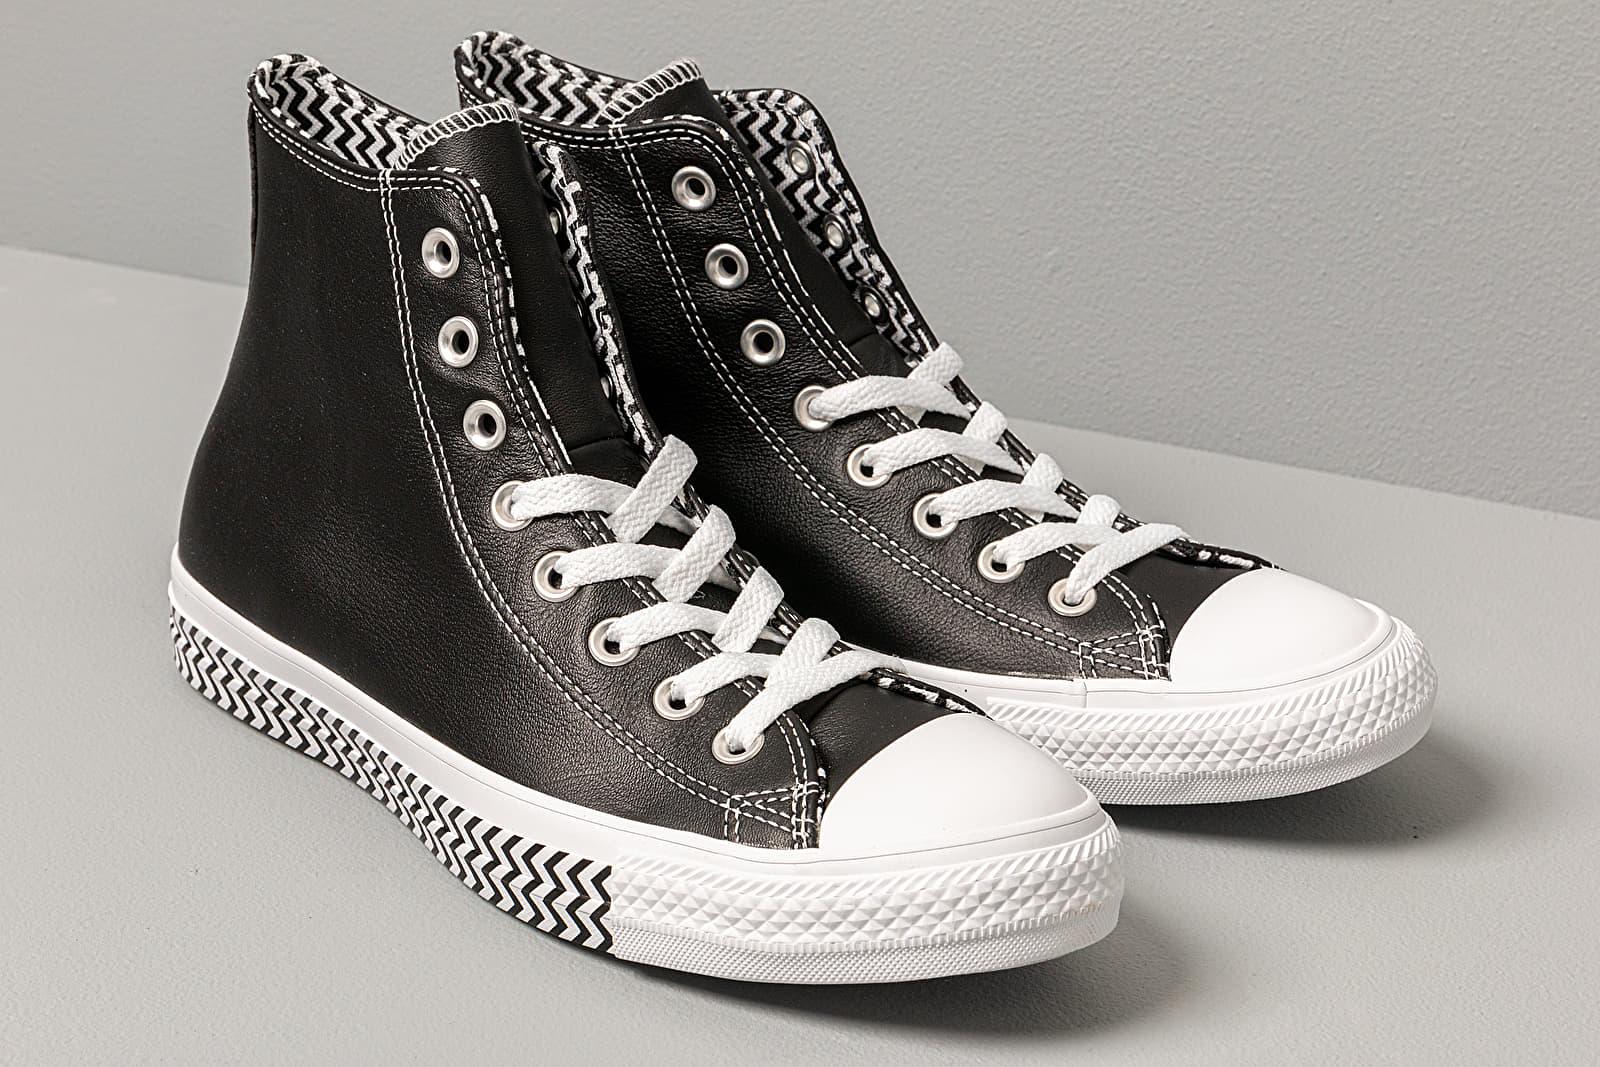 Converse Chuck Taylor All Star Mission V Black White White   Footshop